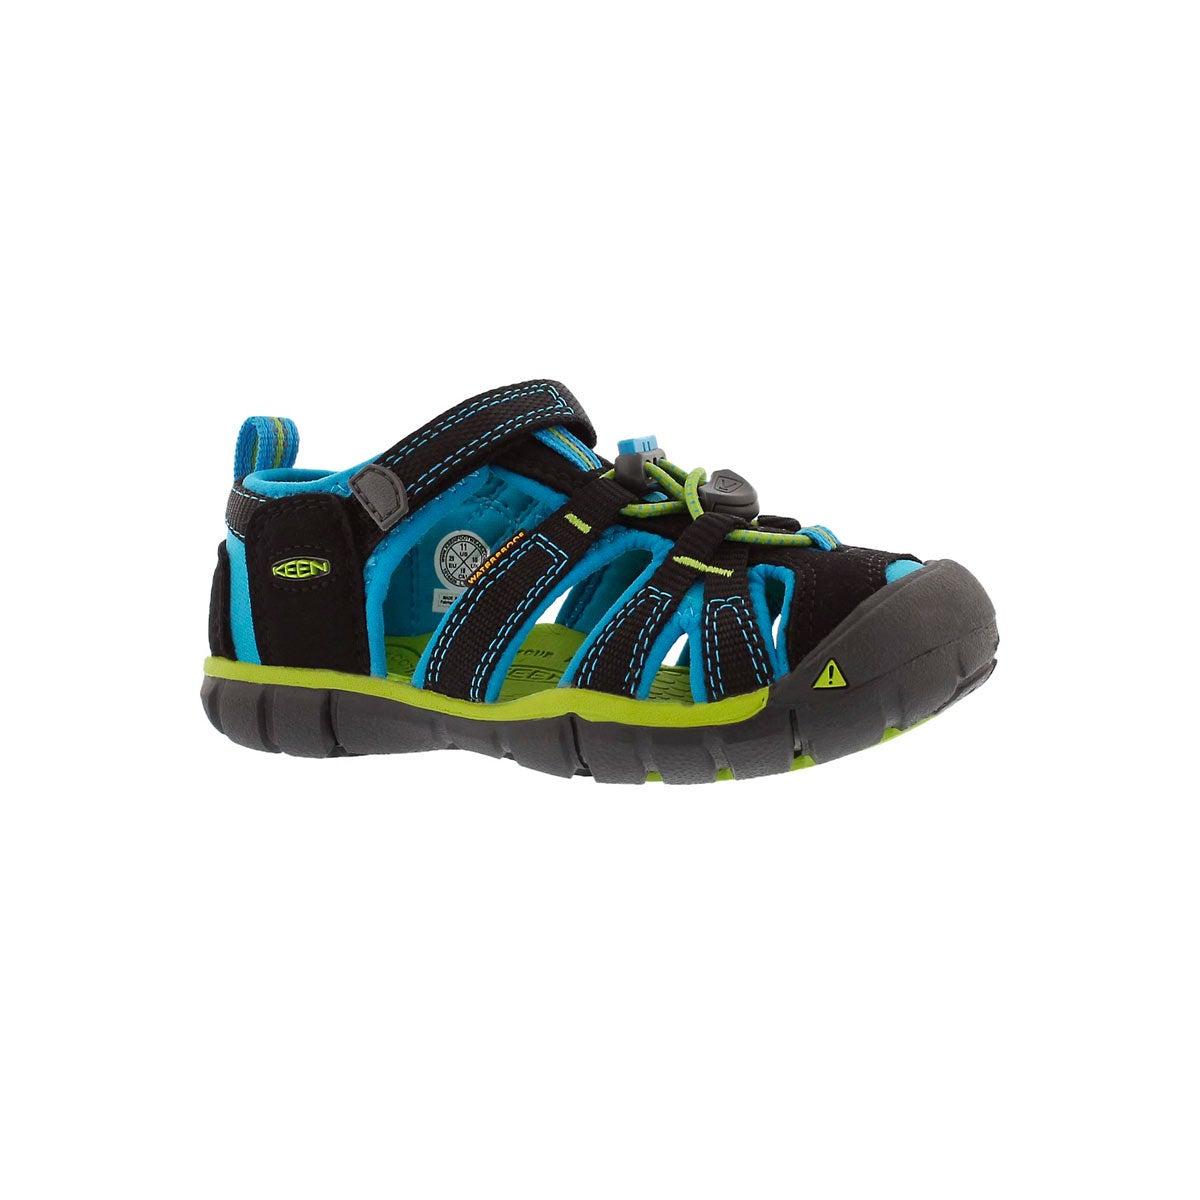 Infants' SEACAMP II black/blue sport sandals